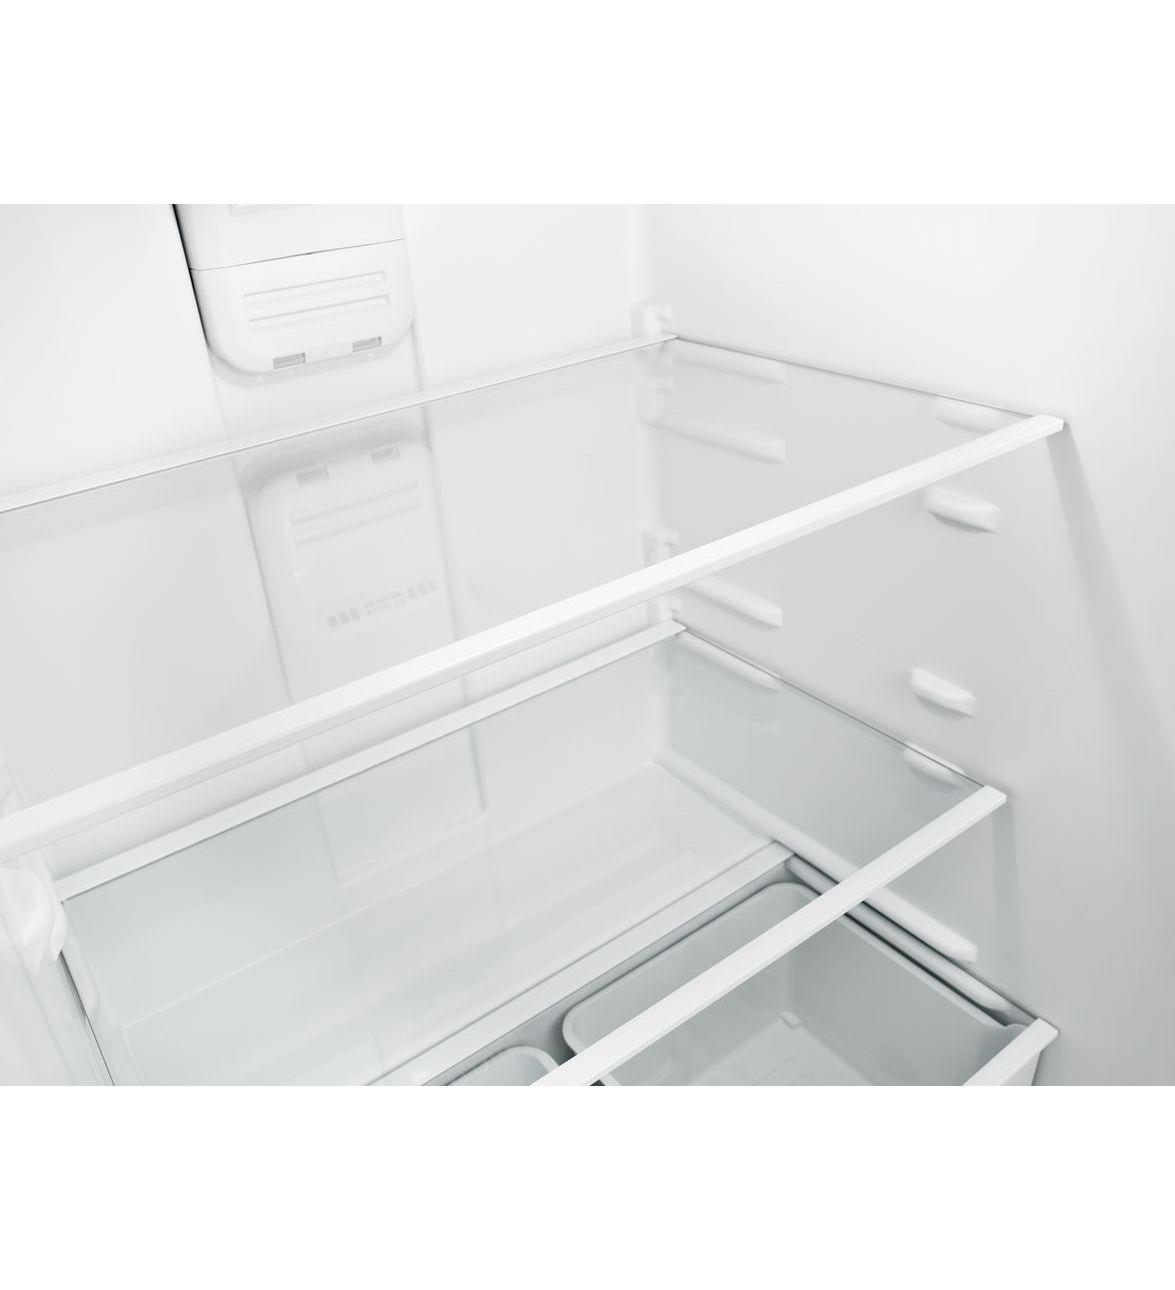 ART318FFDS) Amana® 30-inch Wide Top-Freezer Refrigerator with Glass ...